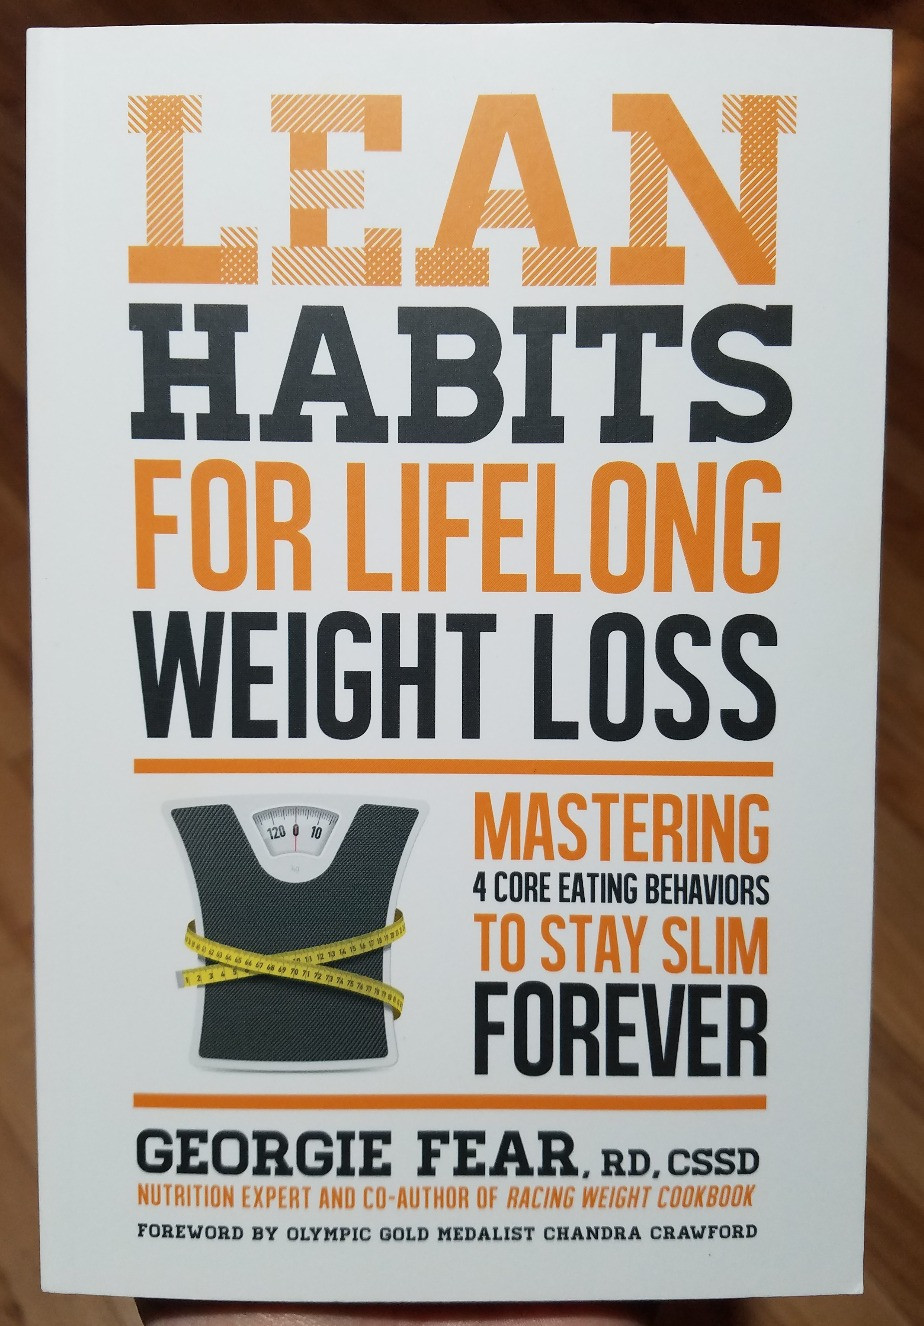 Lean Habits for Lifelong Weightloss | Georgie Fear, RD